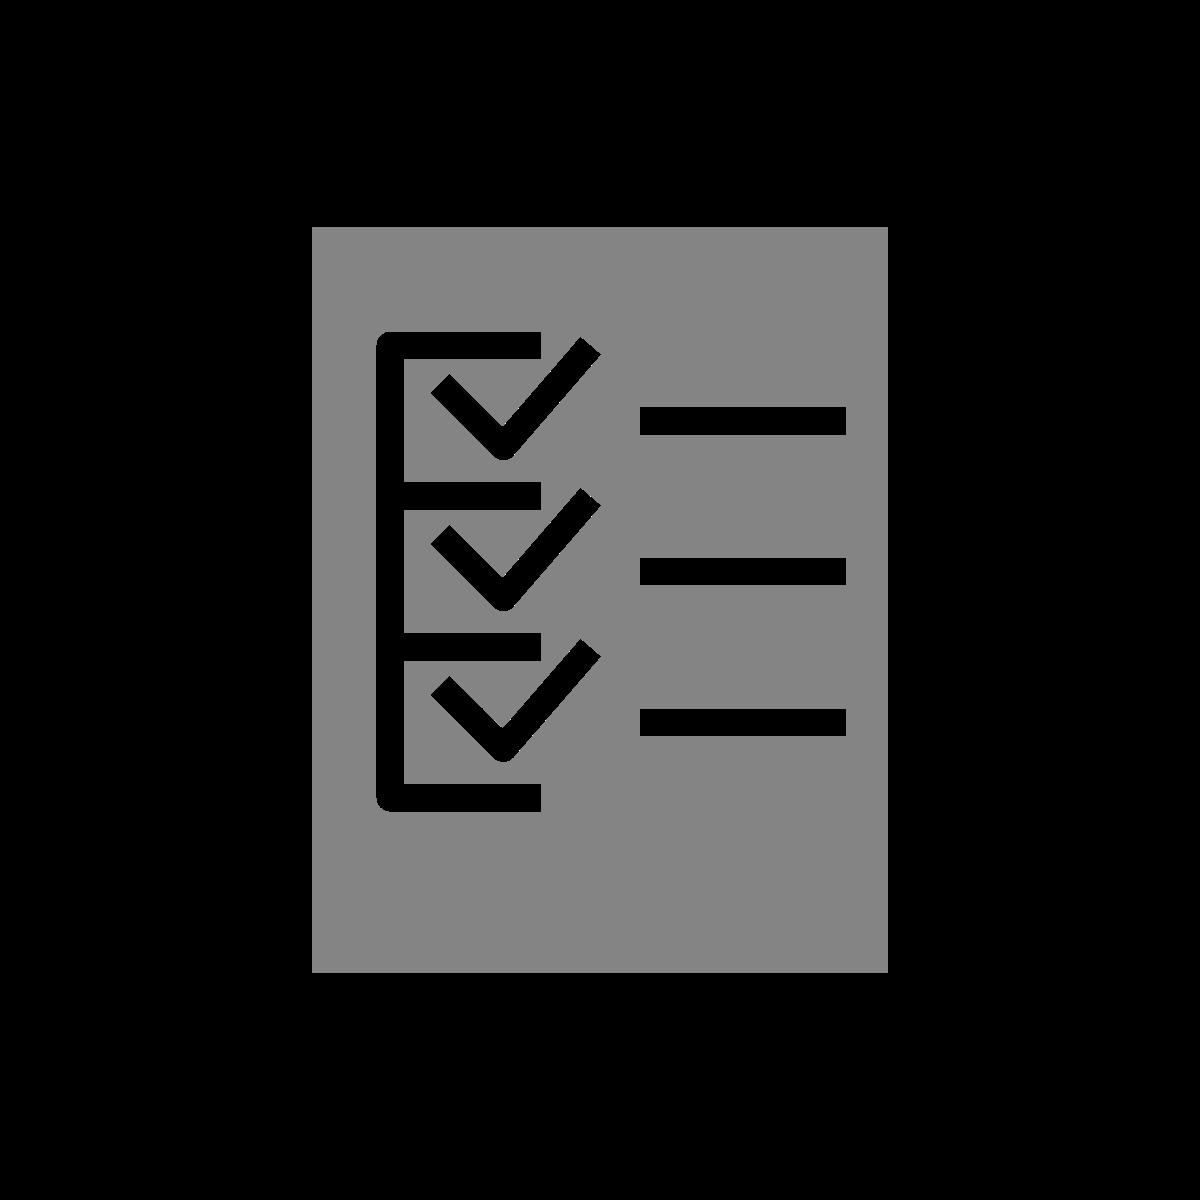 noun_form checklist_924821.png